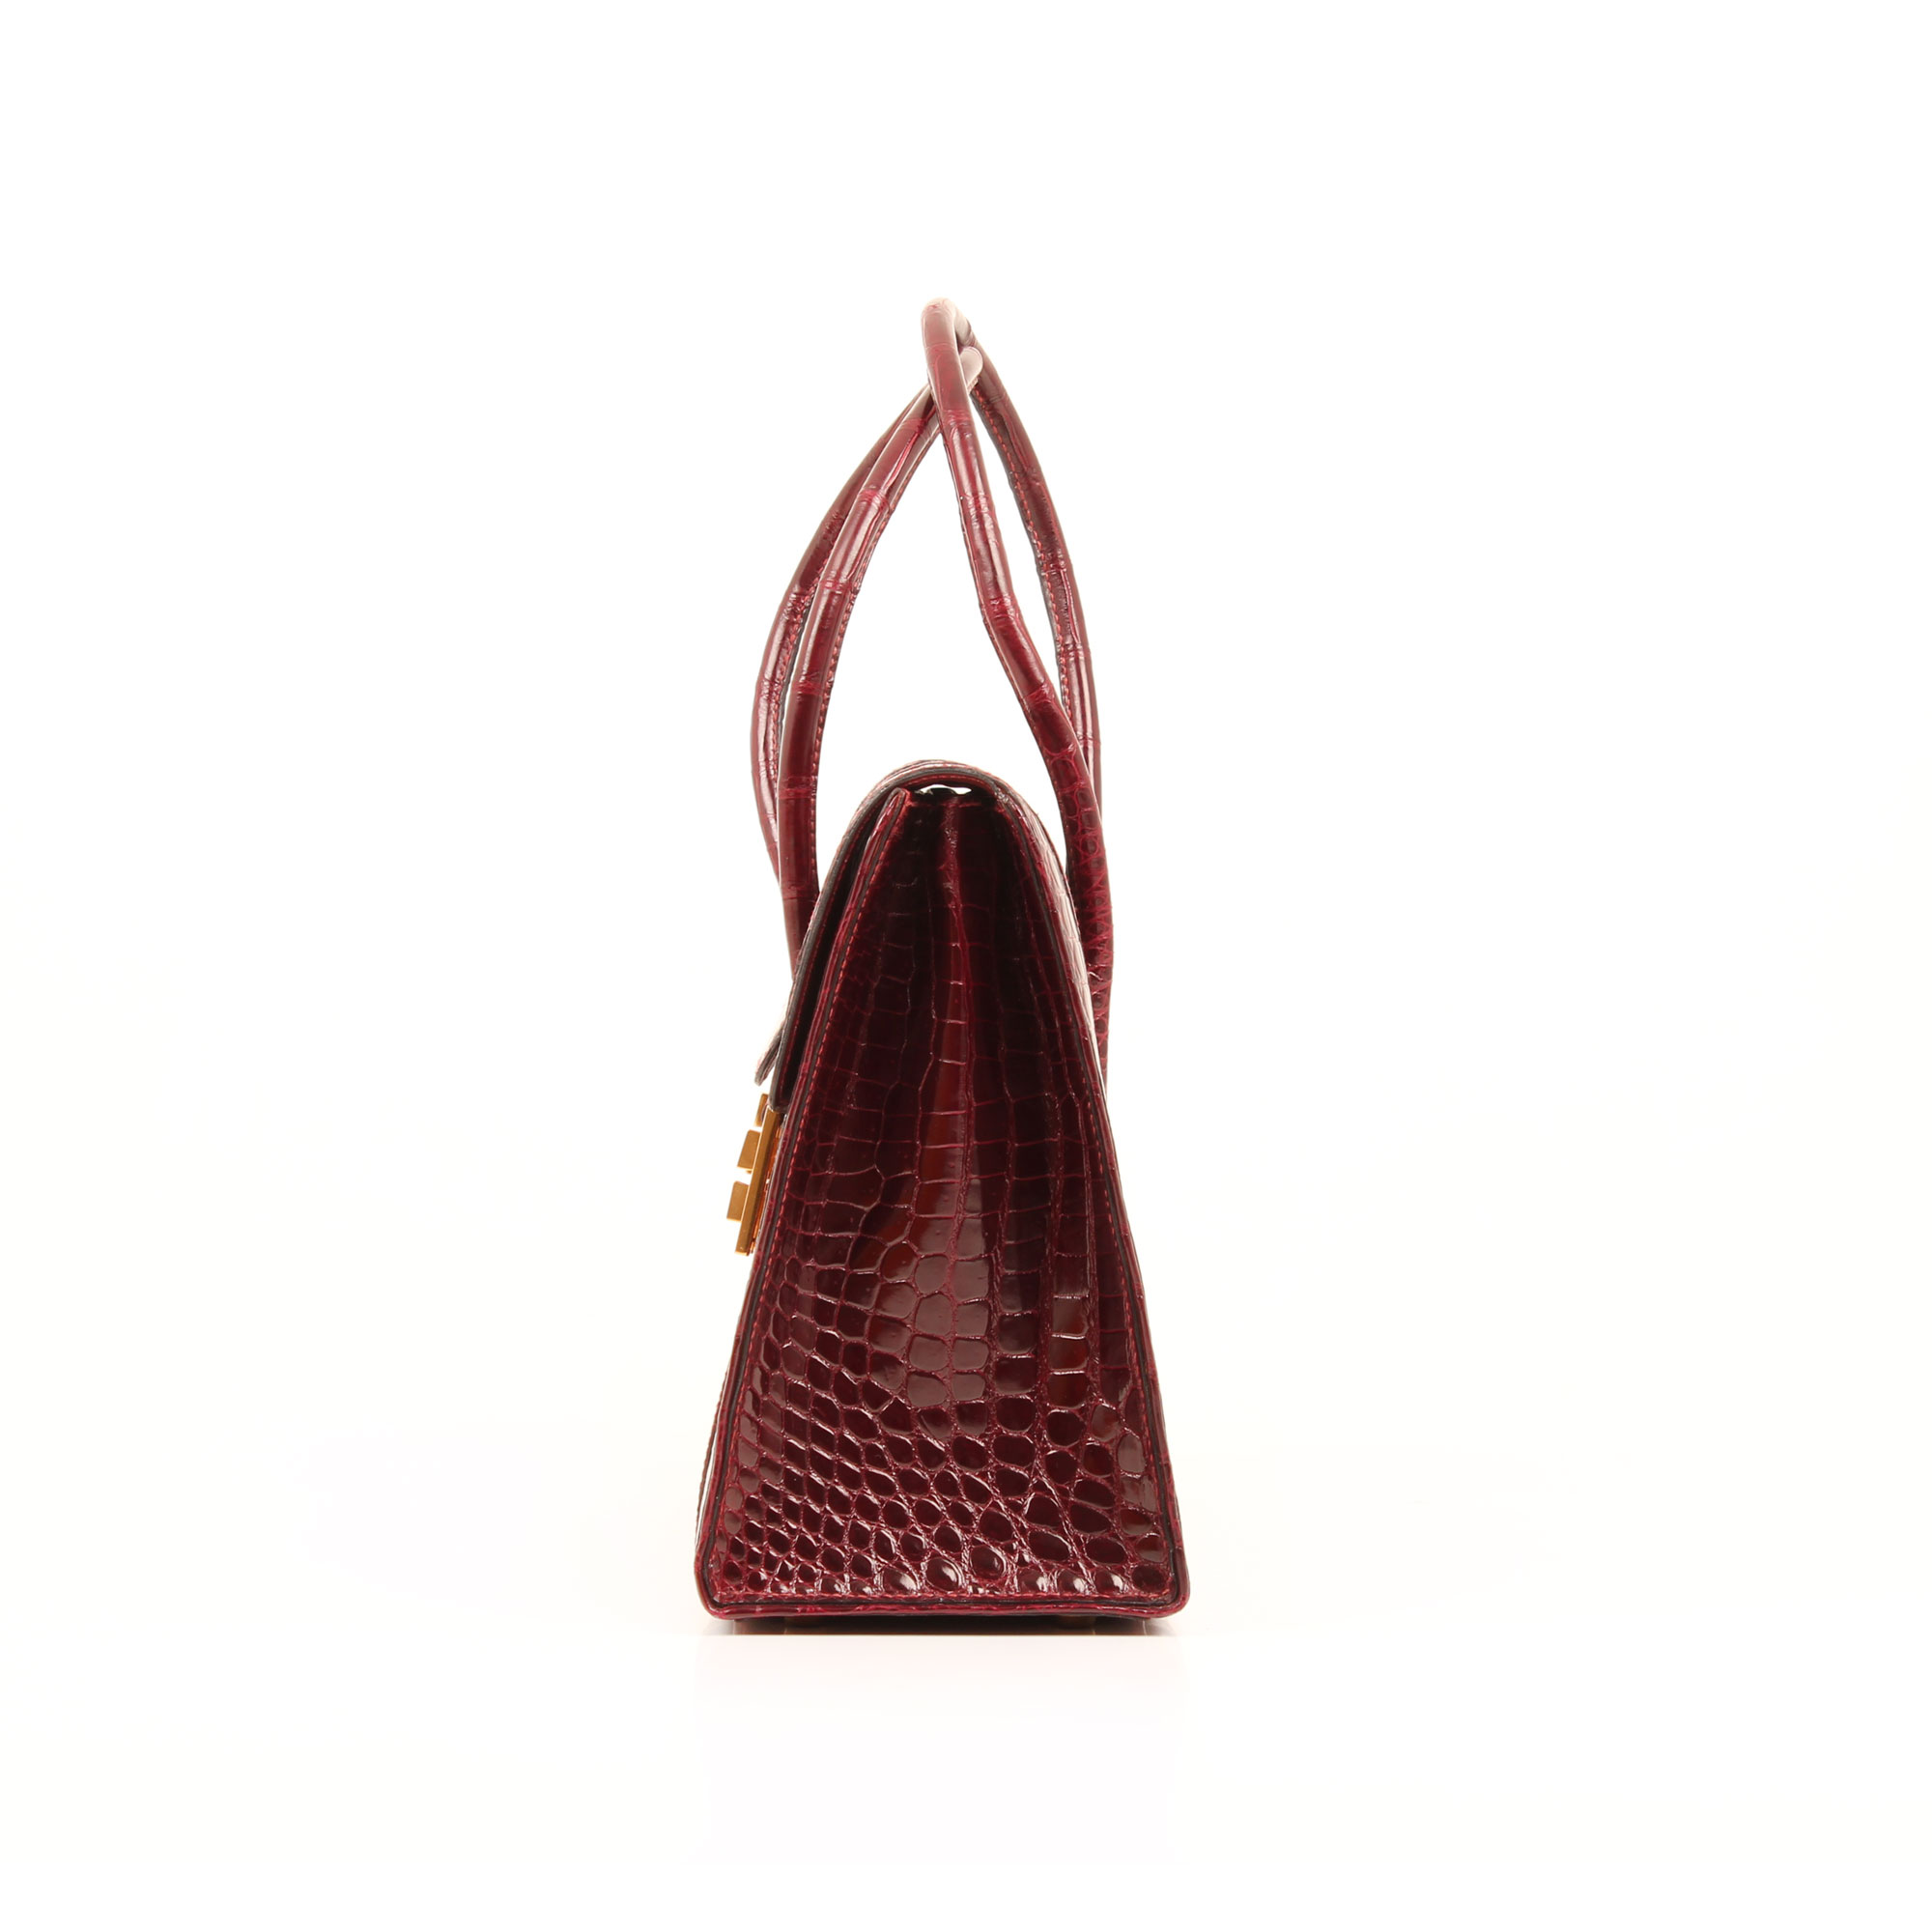 Imagen lateral del bolso hermes drag vintage cocodrilo poroso color frambuesa